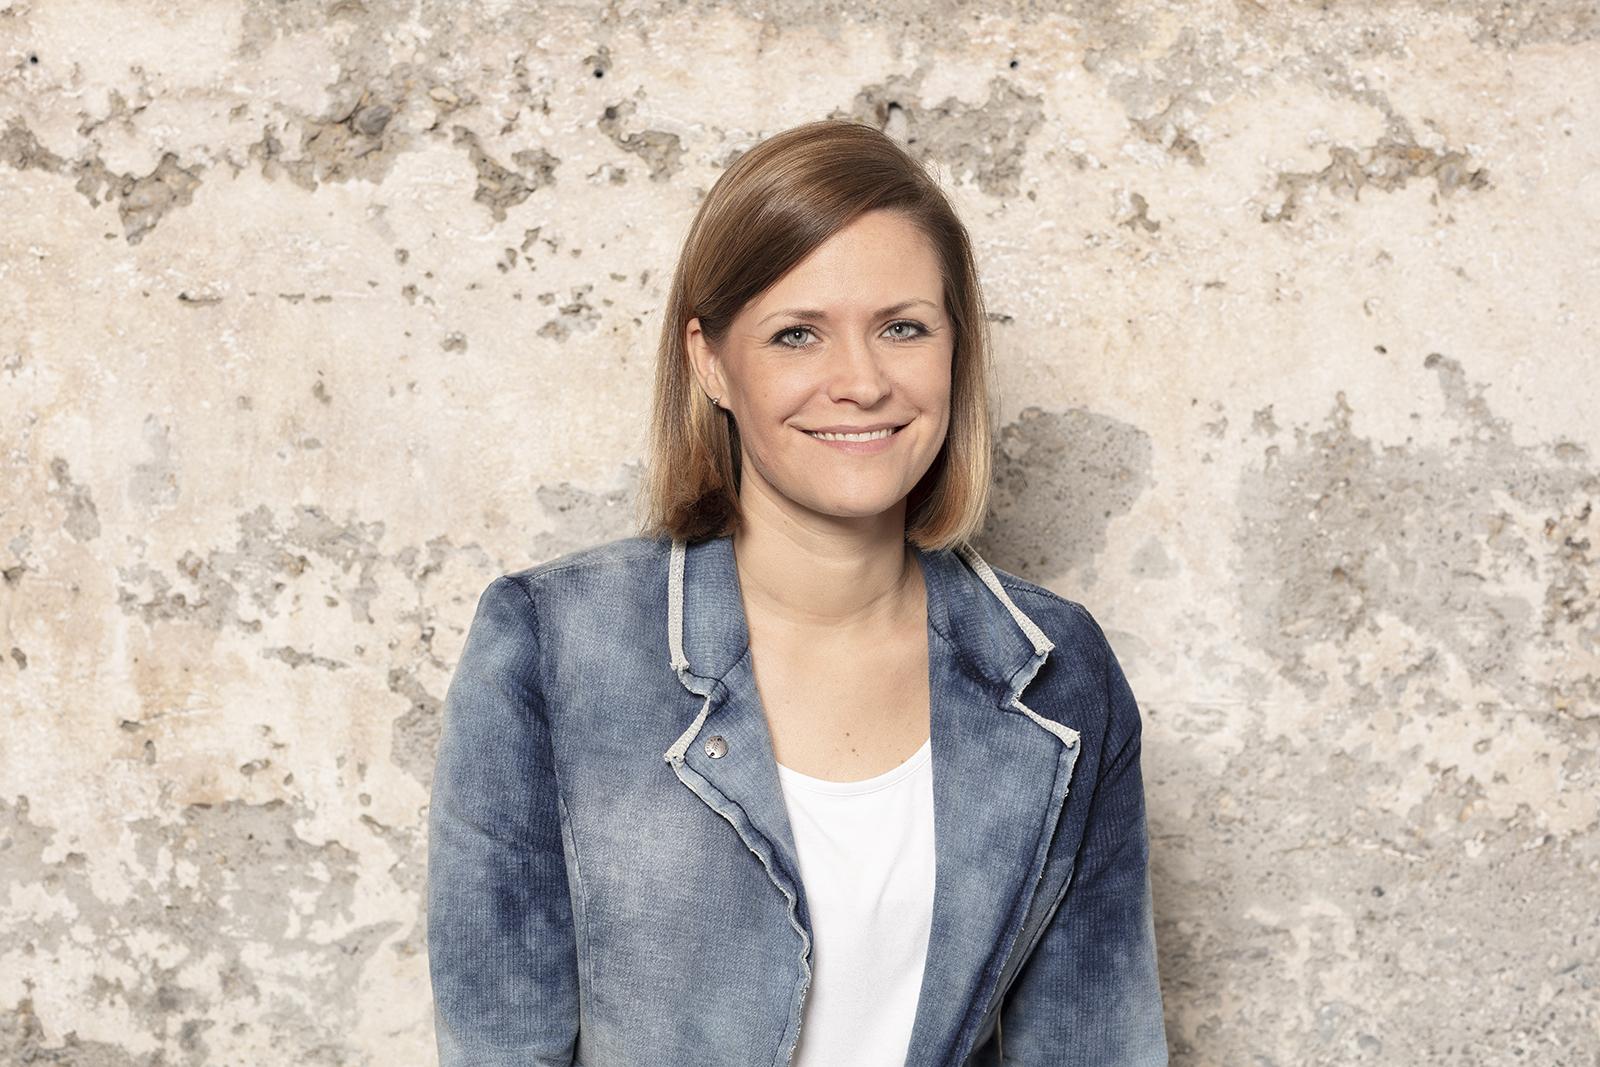 Janine Bürgi